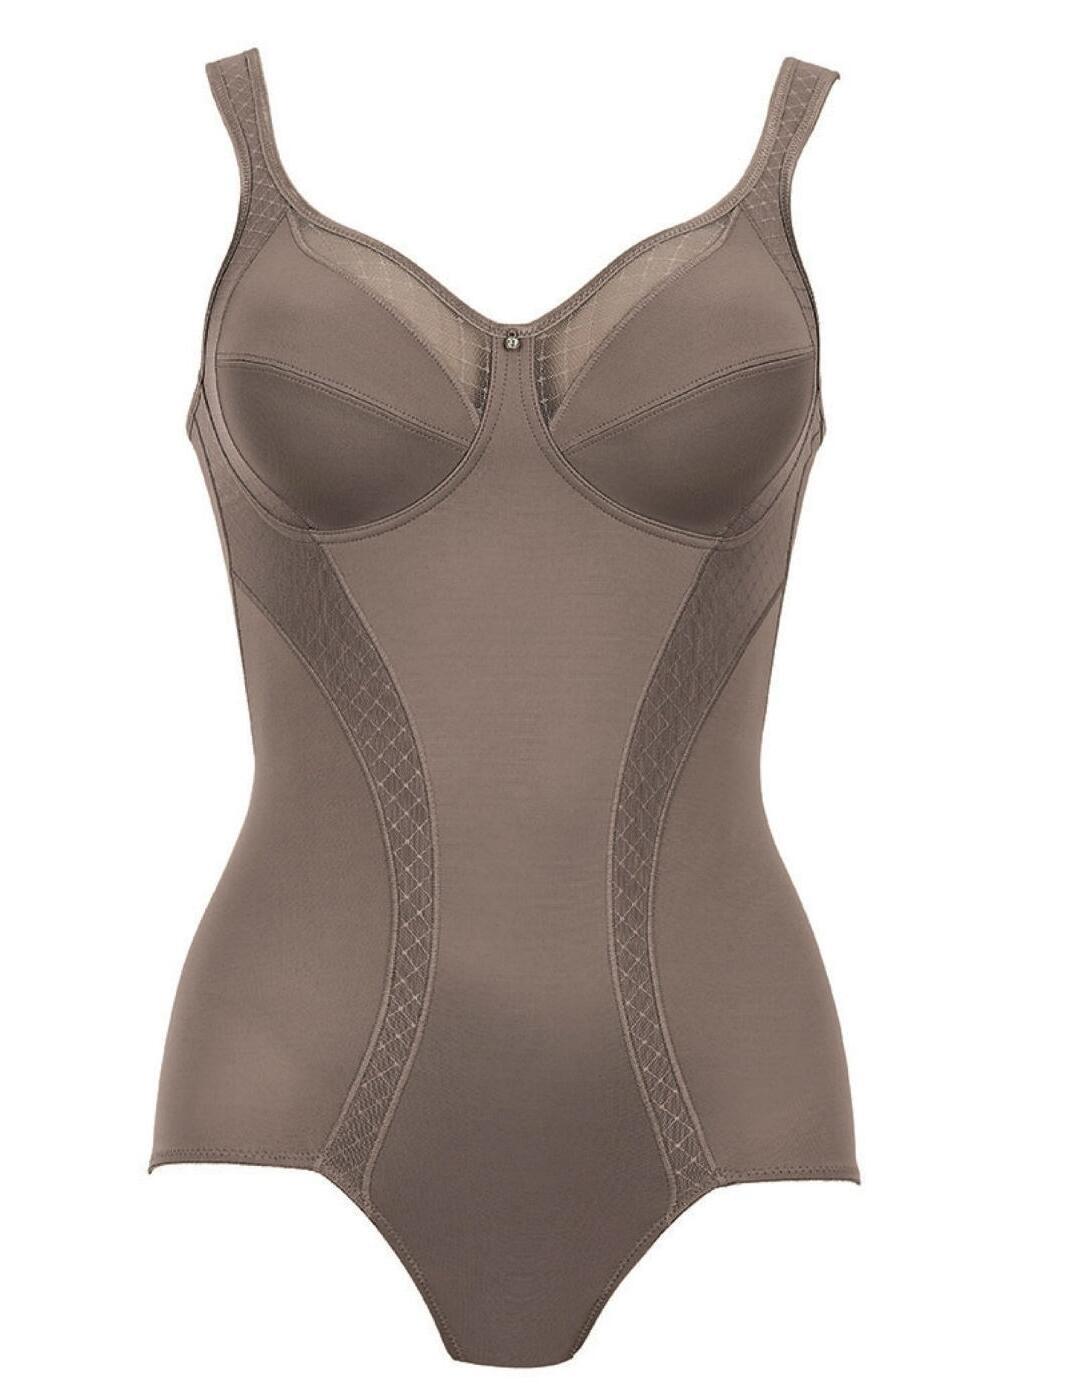 Anita-Comfort-Valentina-Comfort-Corselet-Body-3528-Anita-Shapewear